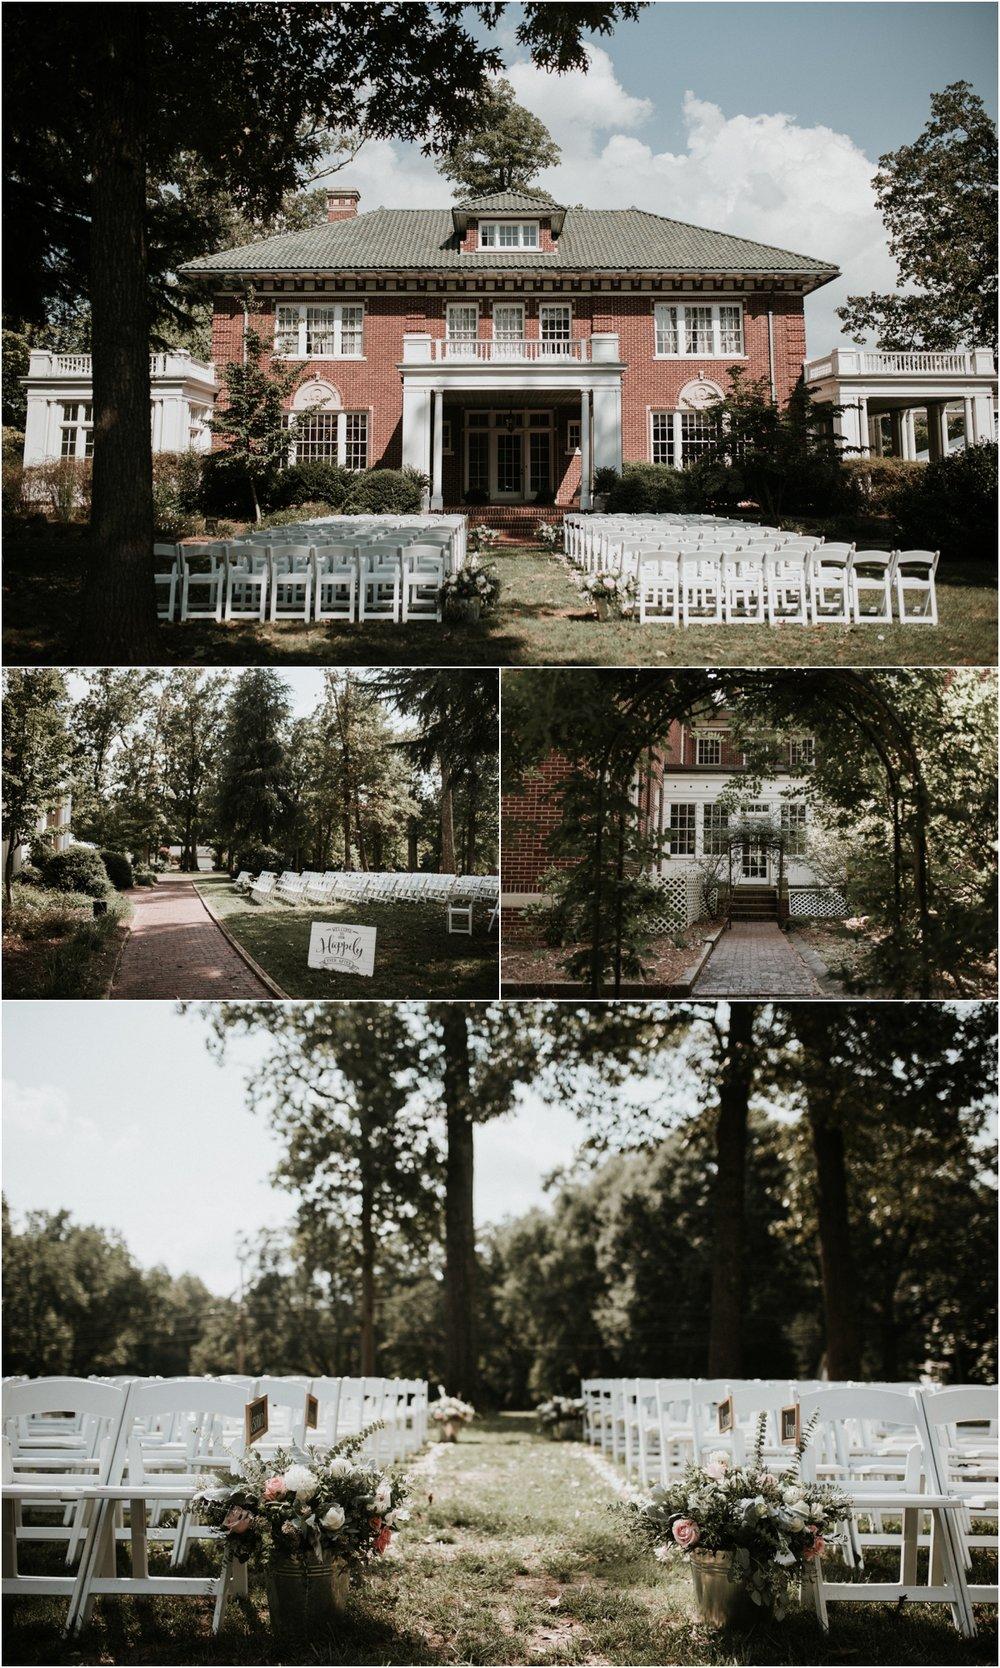 Stowe-manor-wedding-belmont-nc_0069.jpg